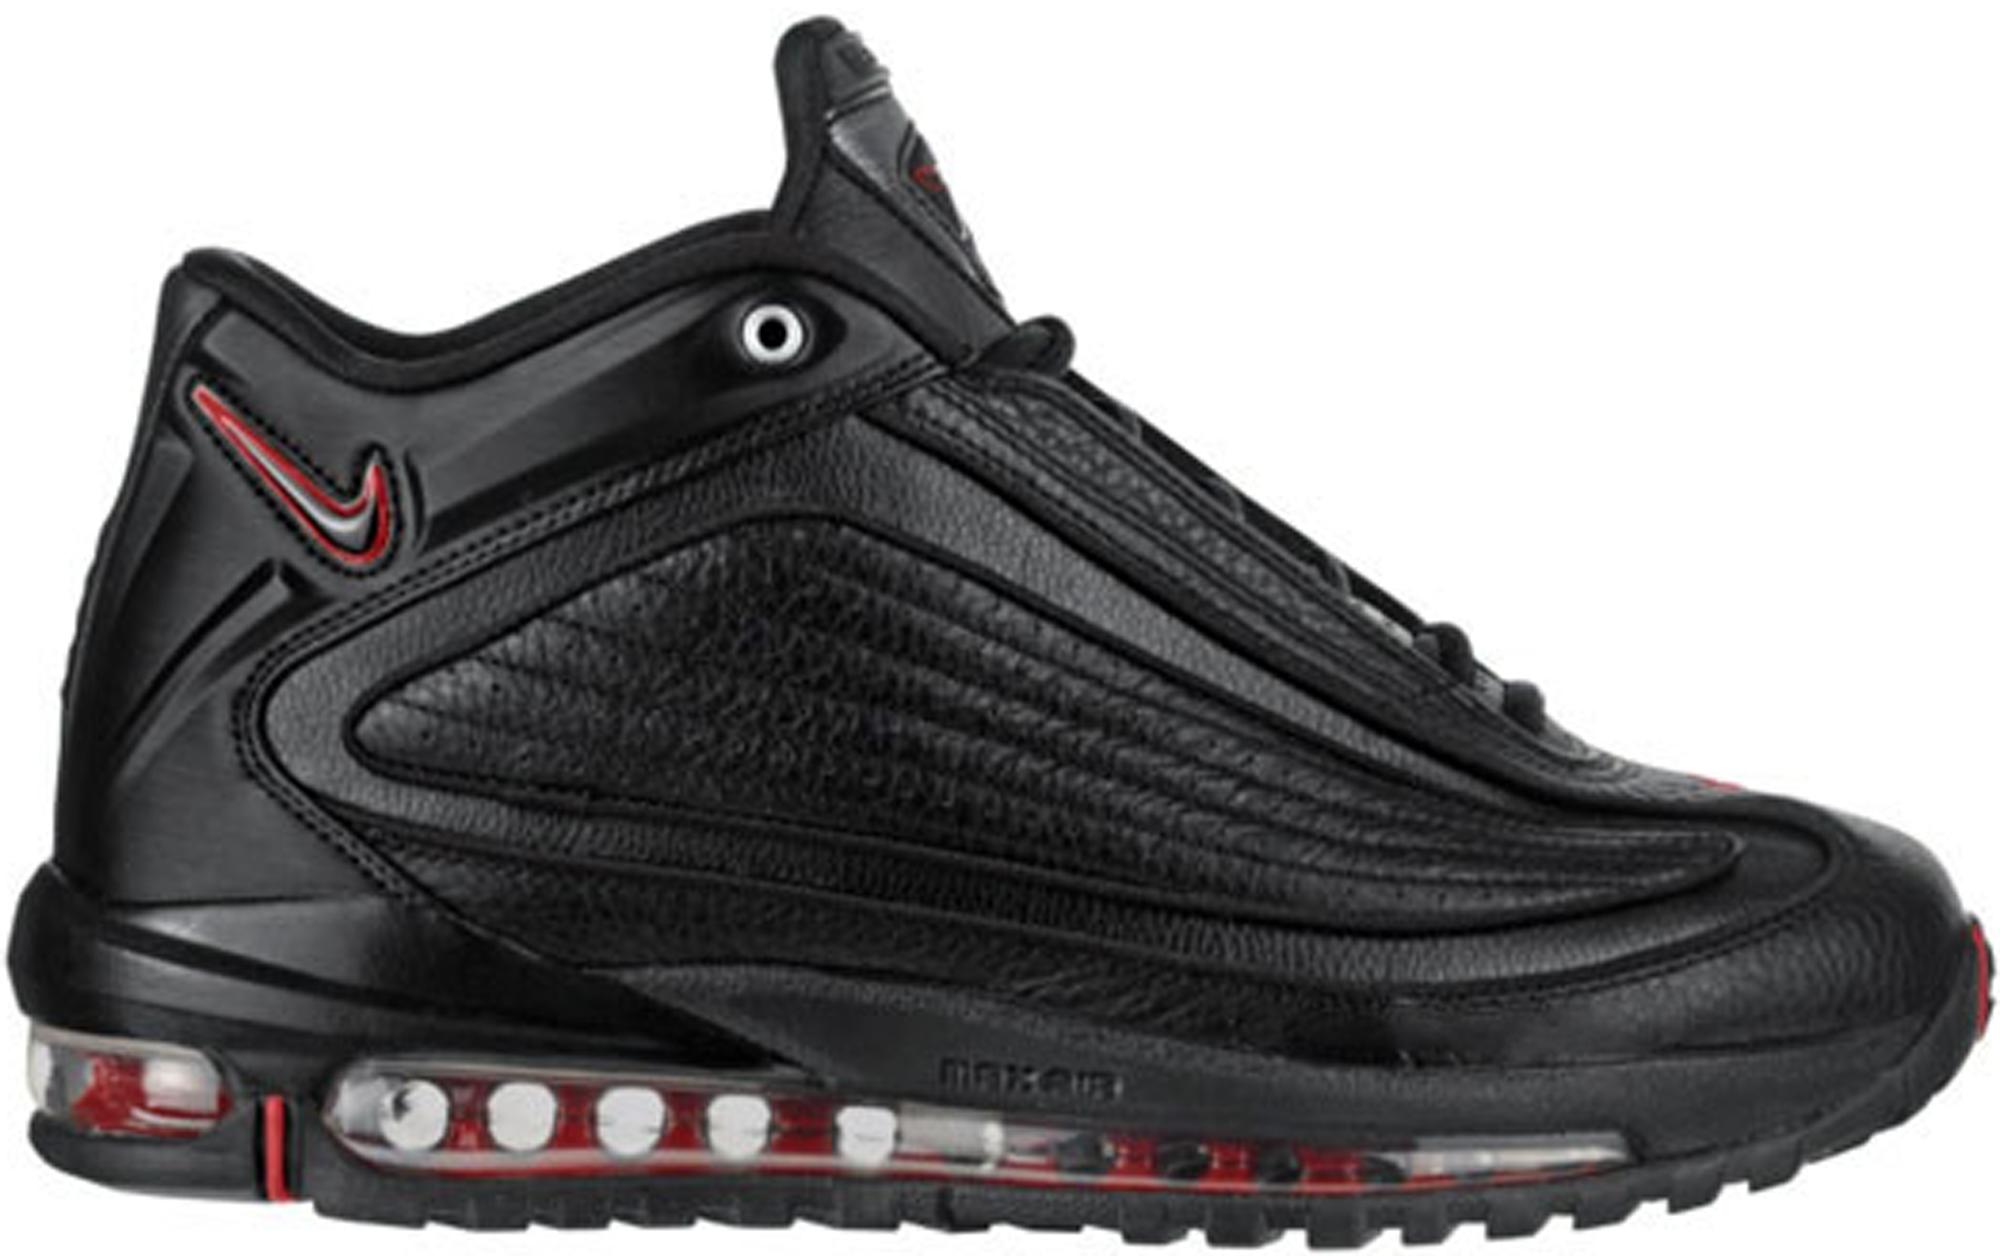 Nike Air Griffey Max GD 2 Black Varsity